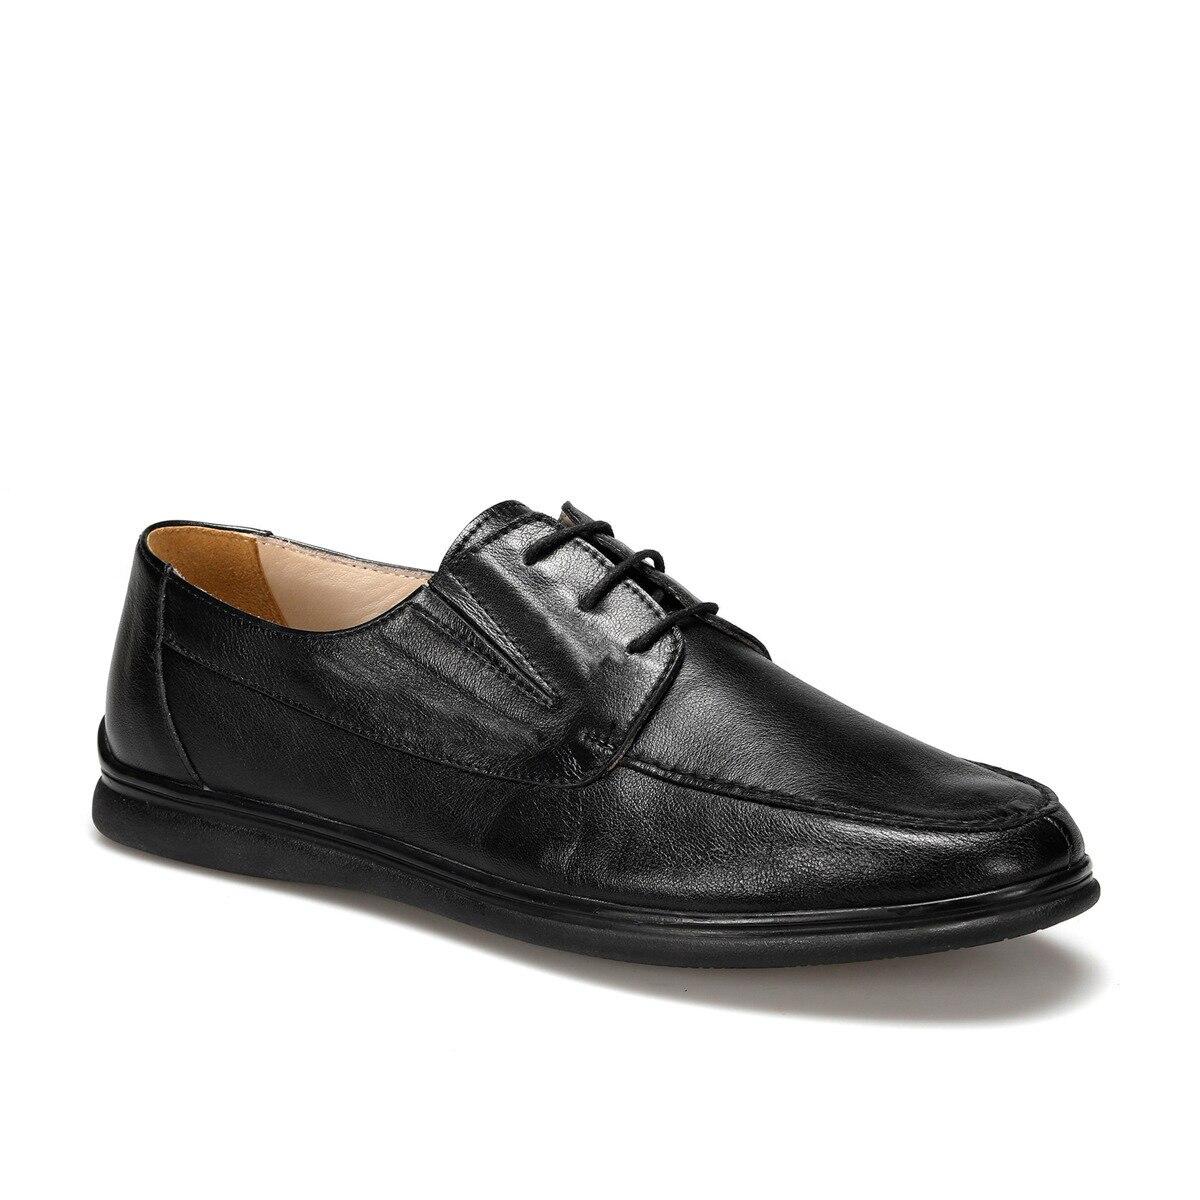 FLO Man Sneakers Black Men Casual Dress Shoes Men MERCEDES PETERSBURG